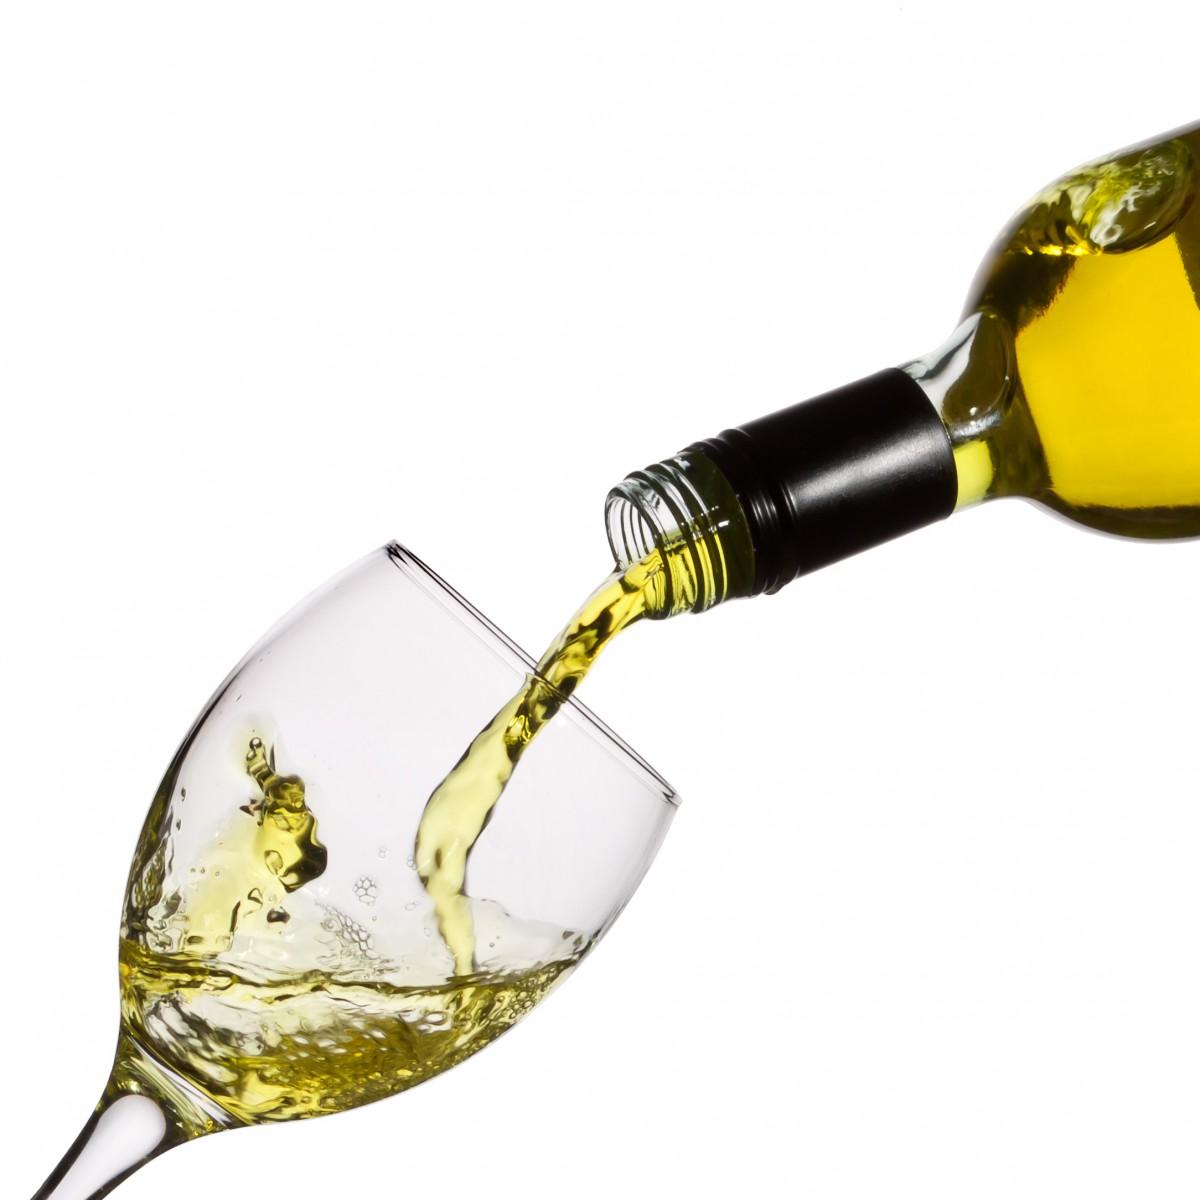 Alicante Wines